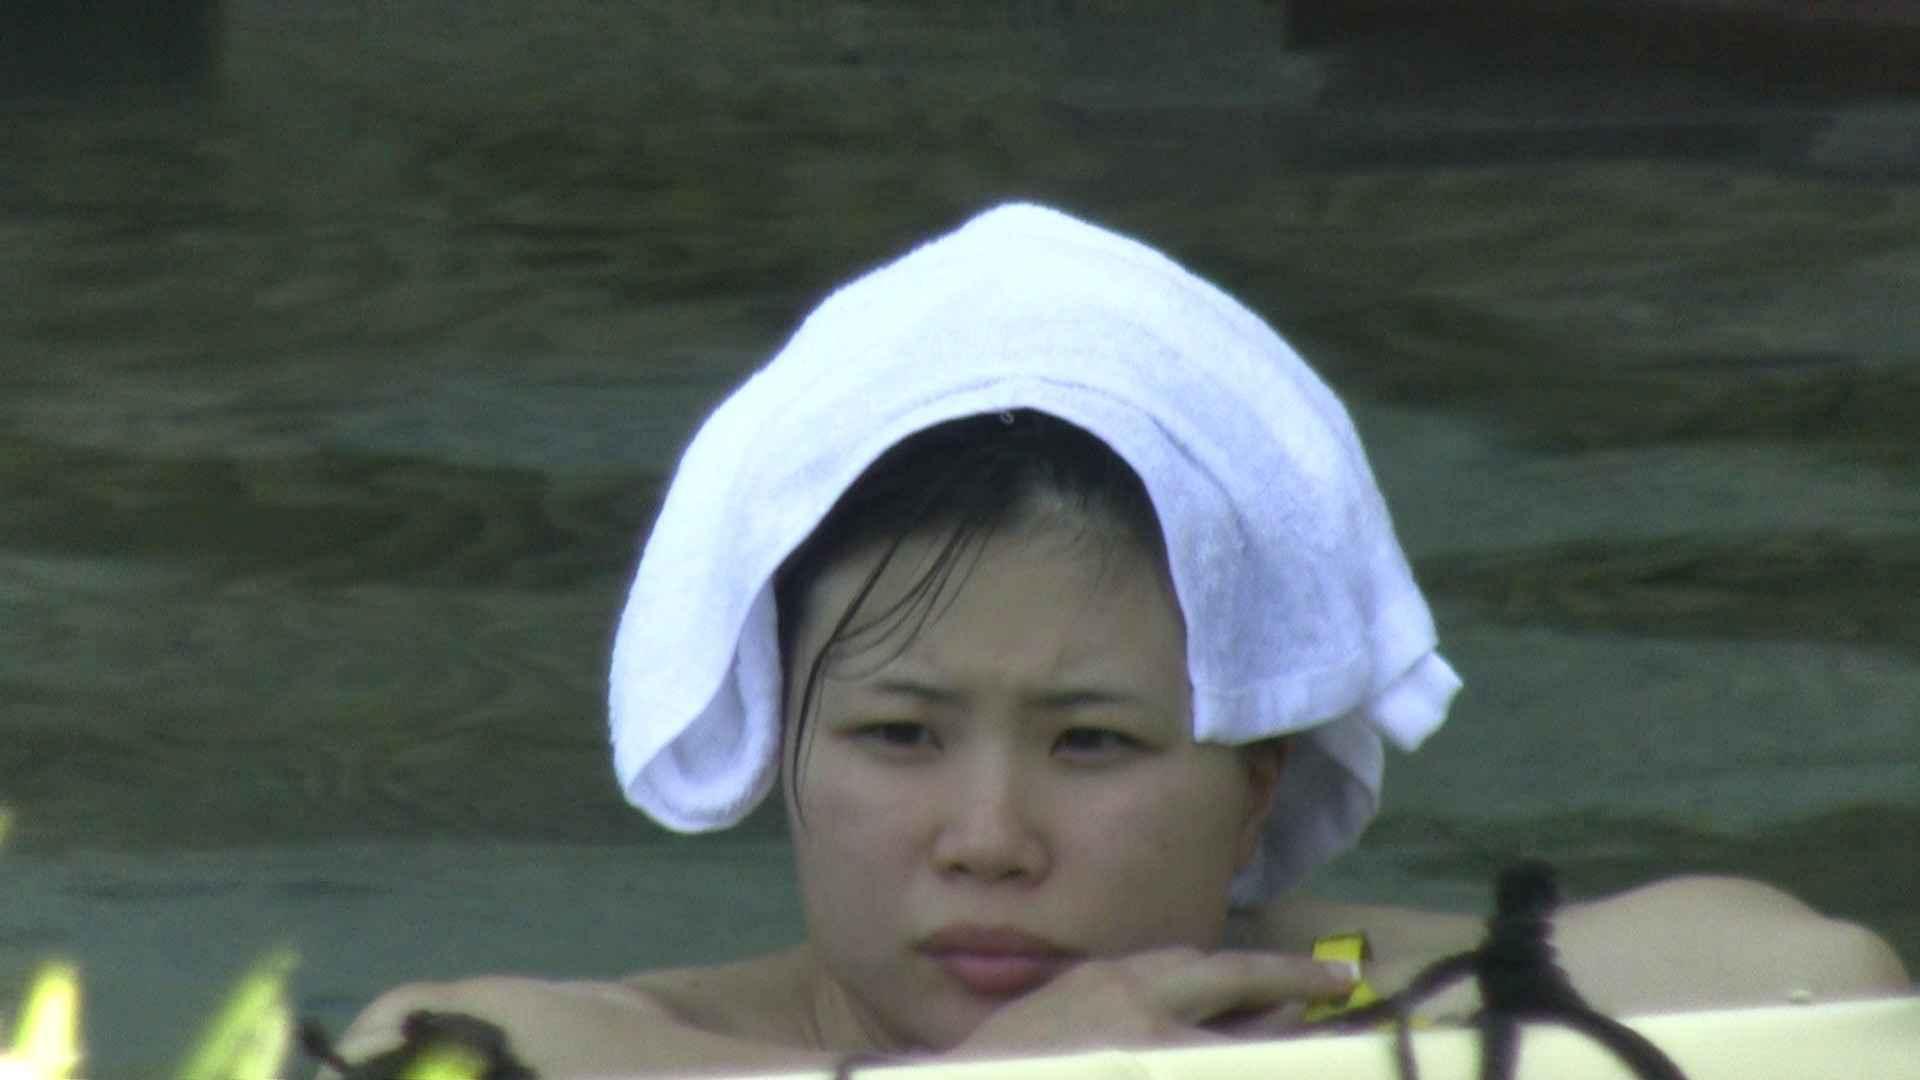 Aquaな露天風呂Vol.183 露天 濡れ場動画紹介 106pic 54